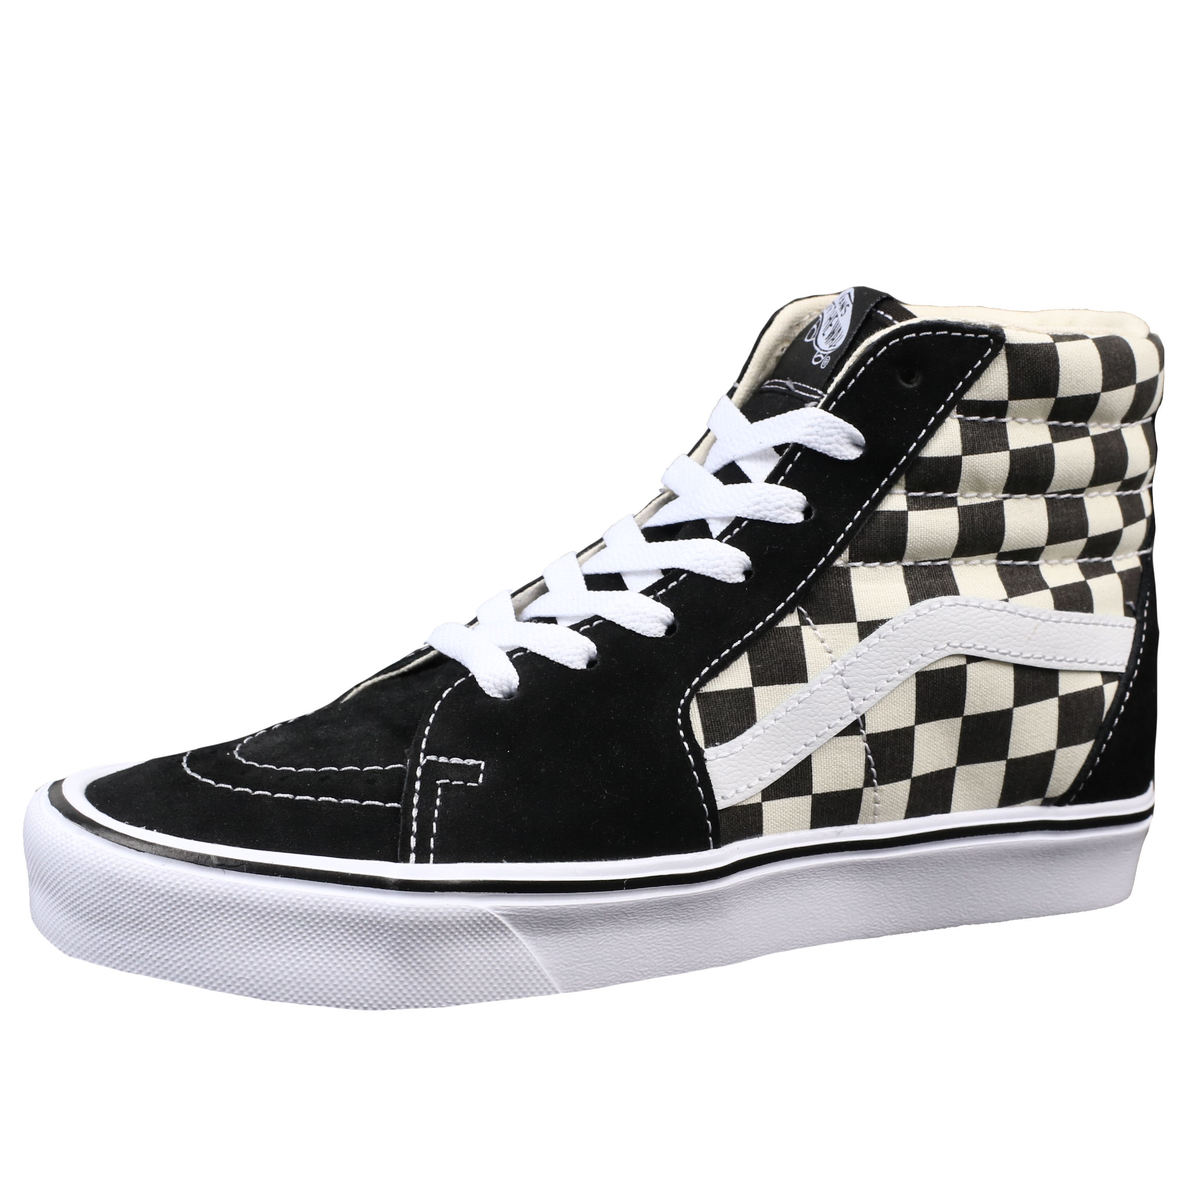 topánky VANS - UA SK8-HI LITE (Checkerboard) - Black/White - VA2Z5Y5GX